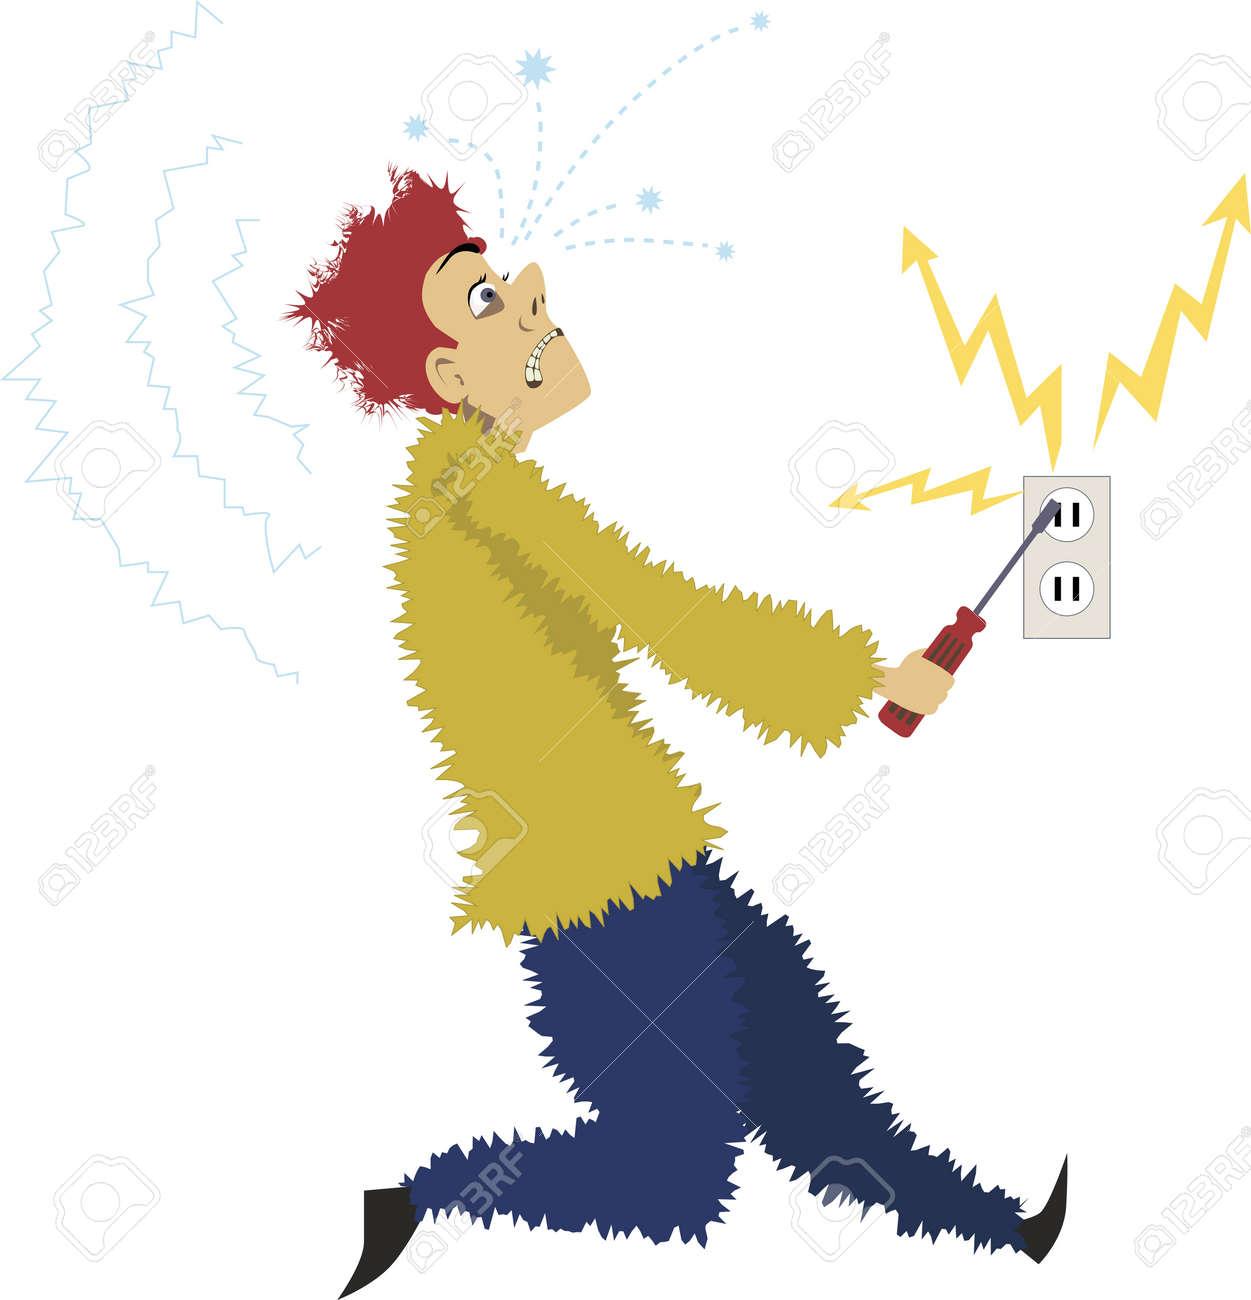 Cartoon Man Gets Electrocuted Sticking A Screwdriver Into An ...